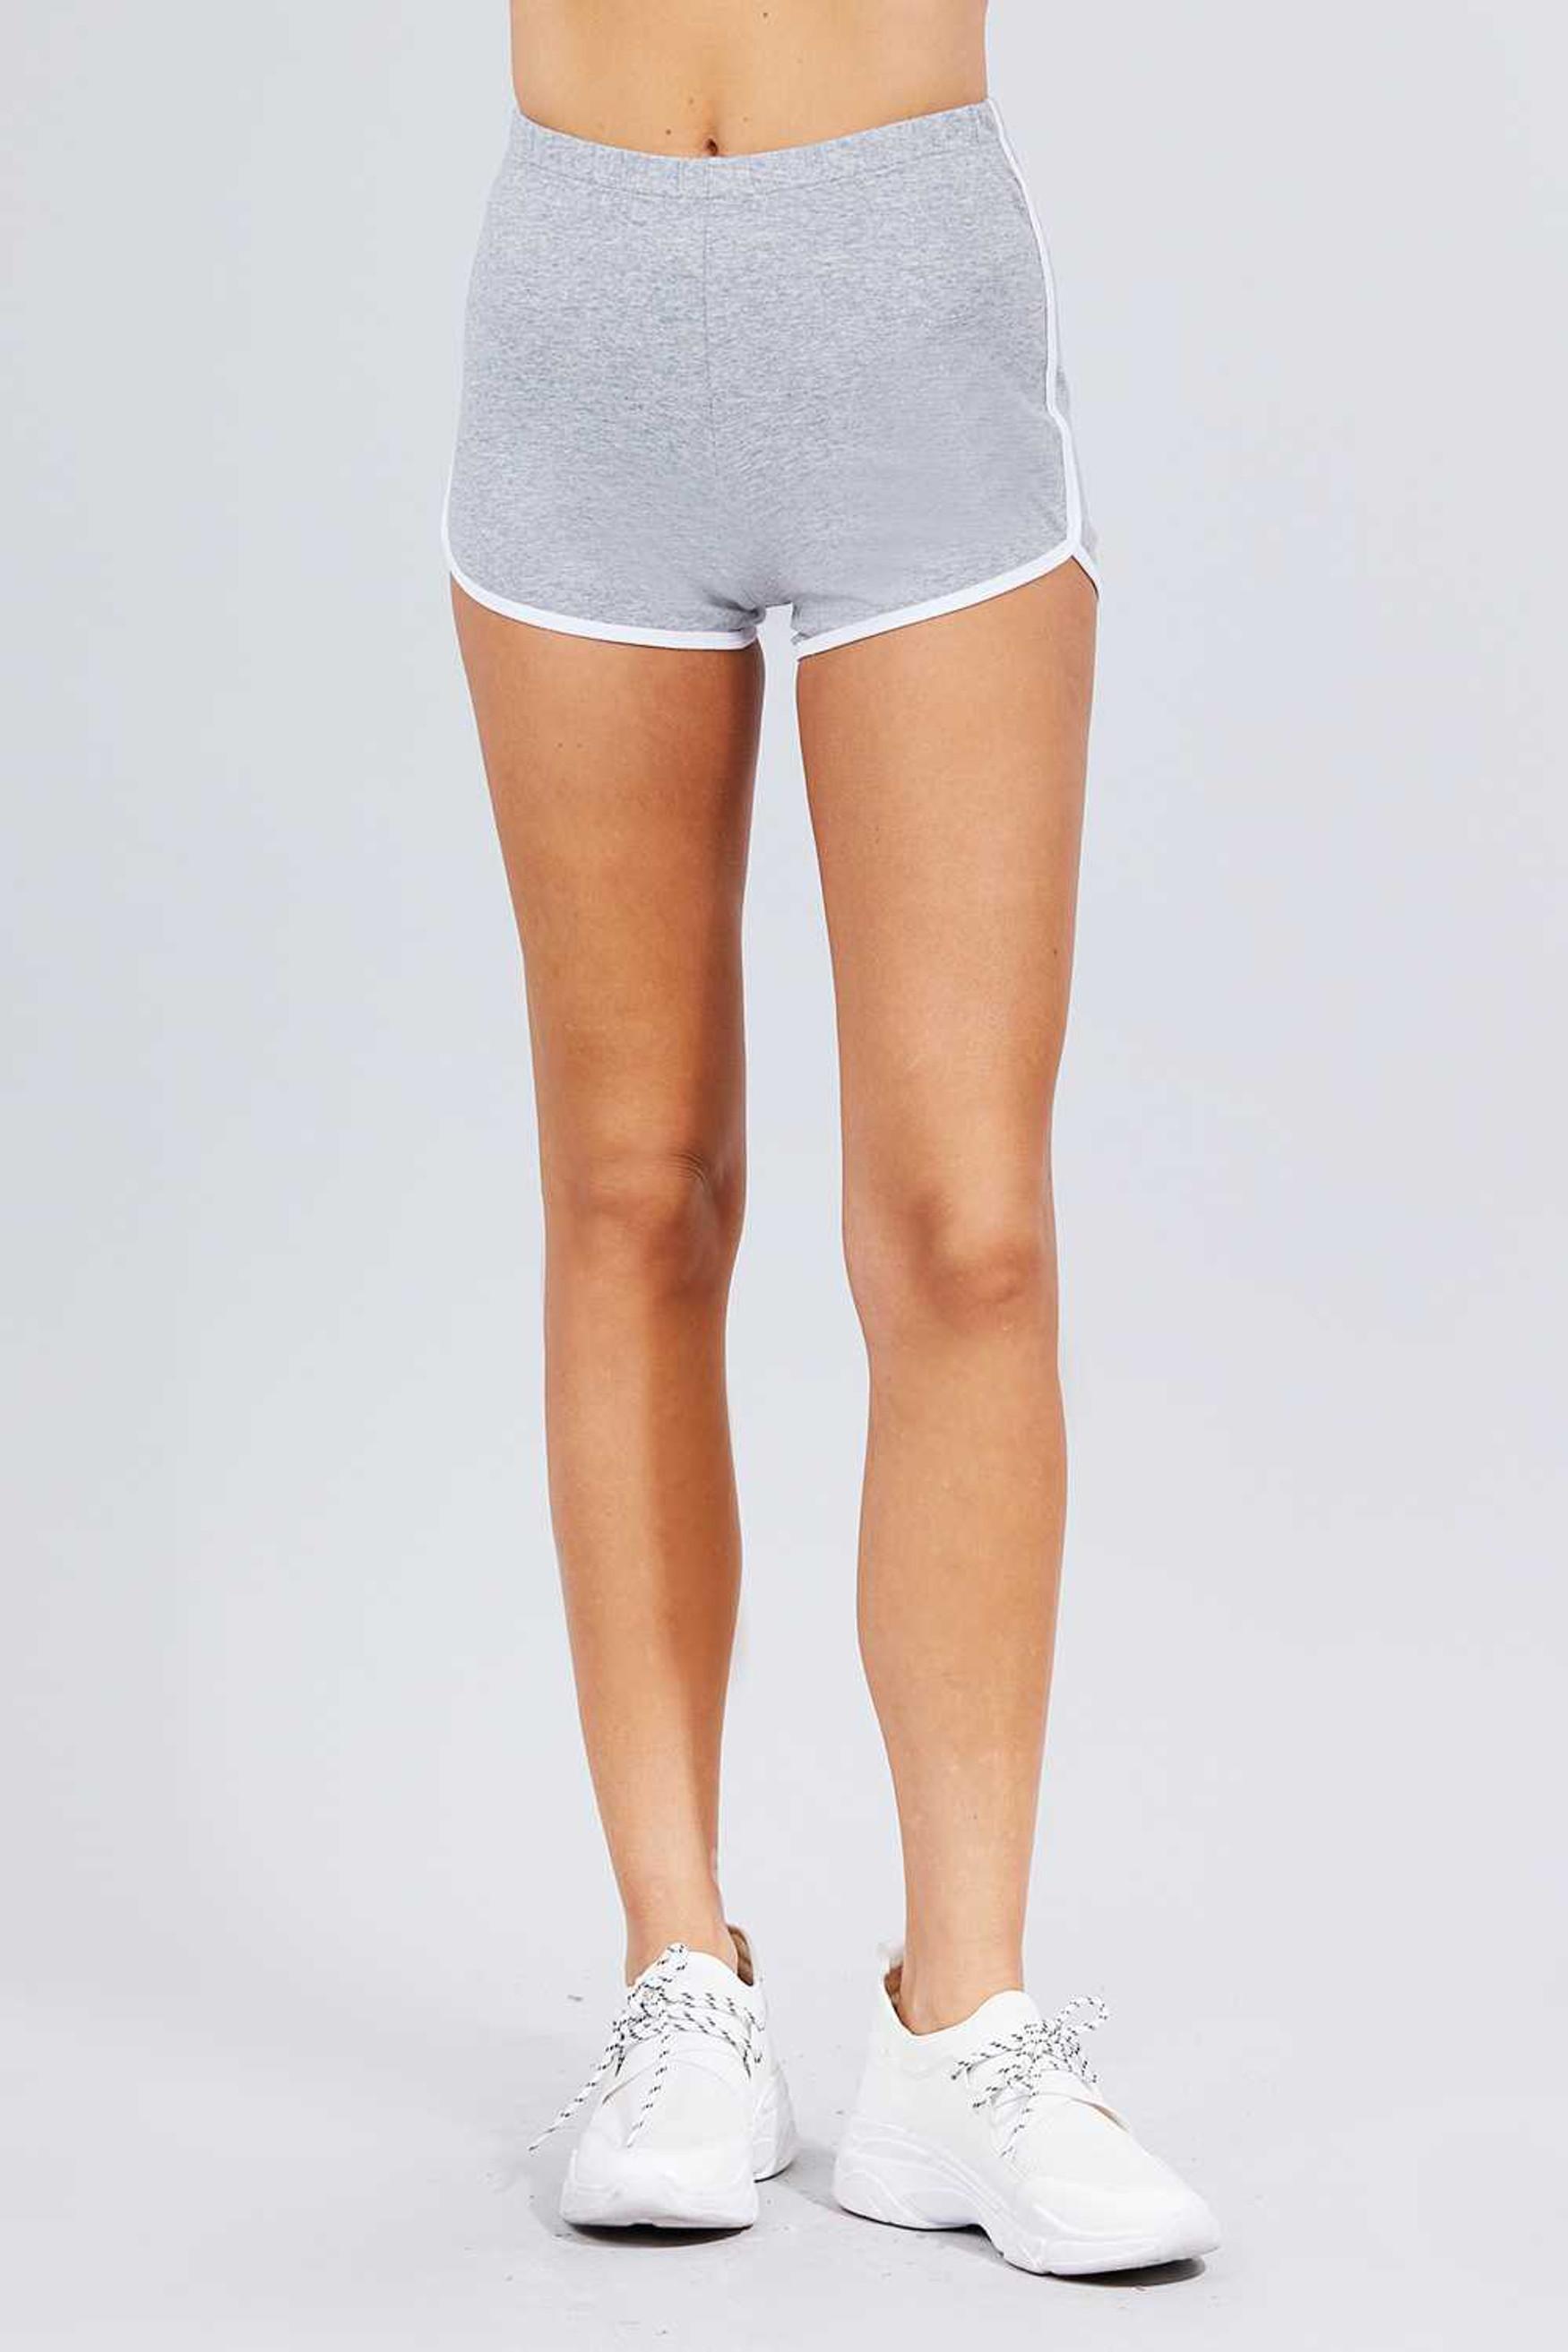 Heather Gray Basic Cotton Side Stripe Dolphin Shorts